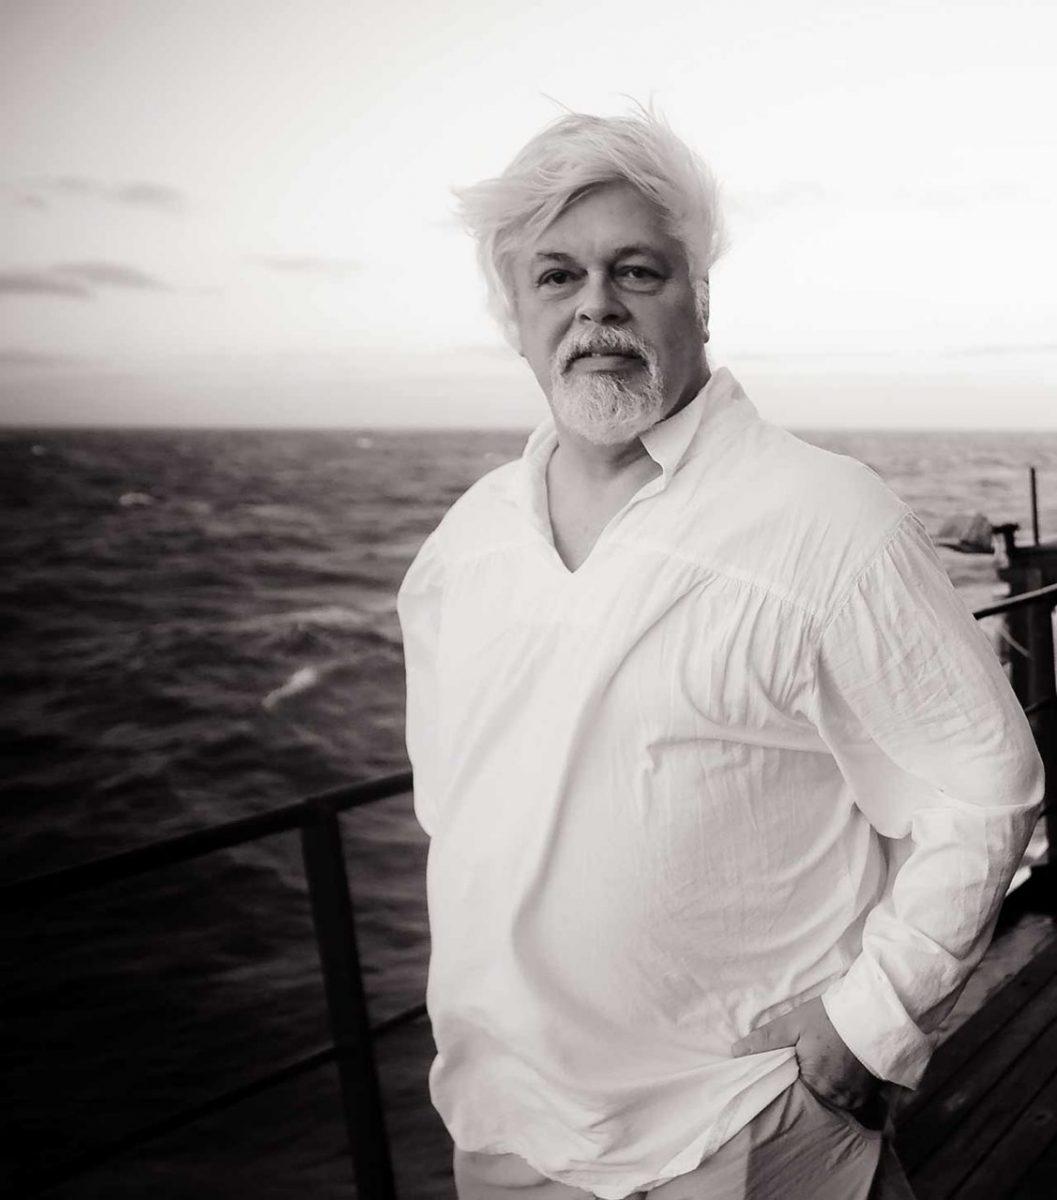 Sea Shepherd founder Captain Paul Watson. Antarctic Ocean